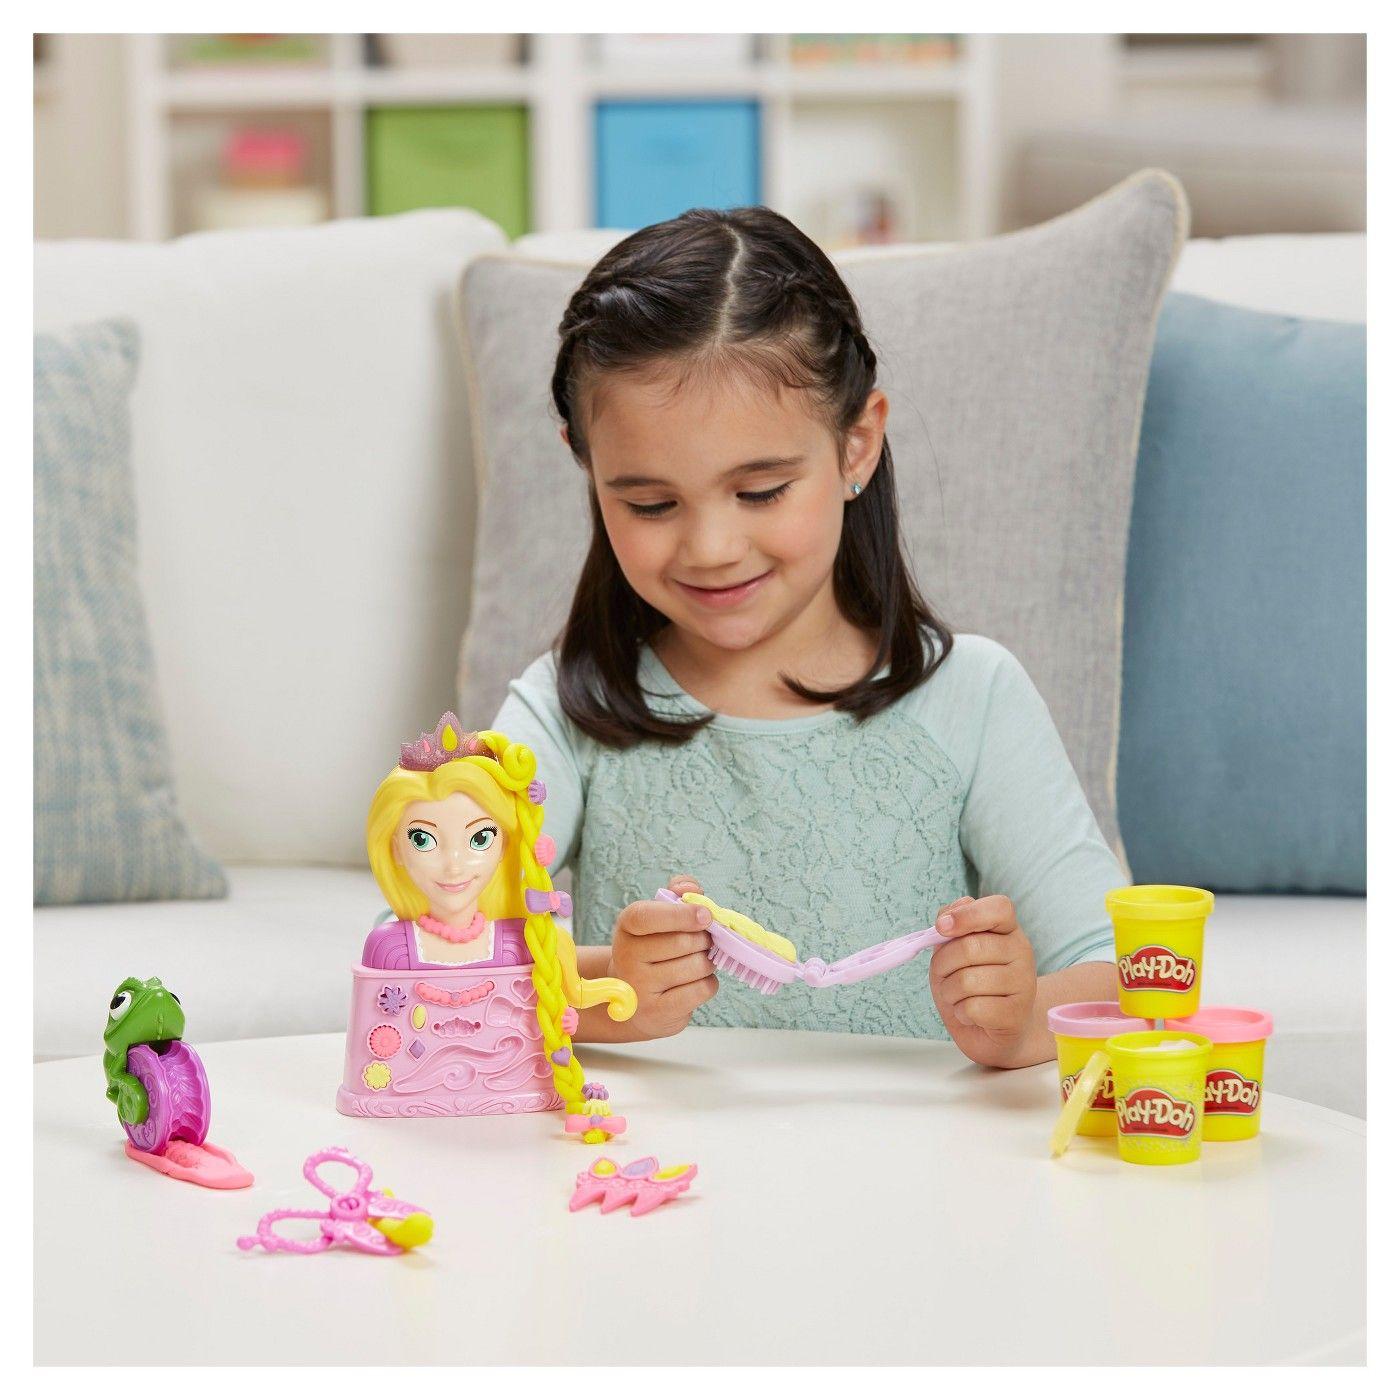 Play-Doh Royal Salon Featuring Disney Princess Rapunzel